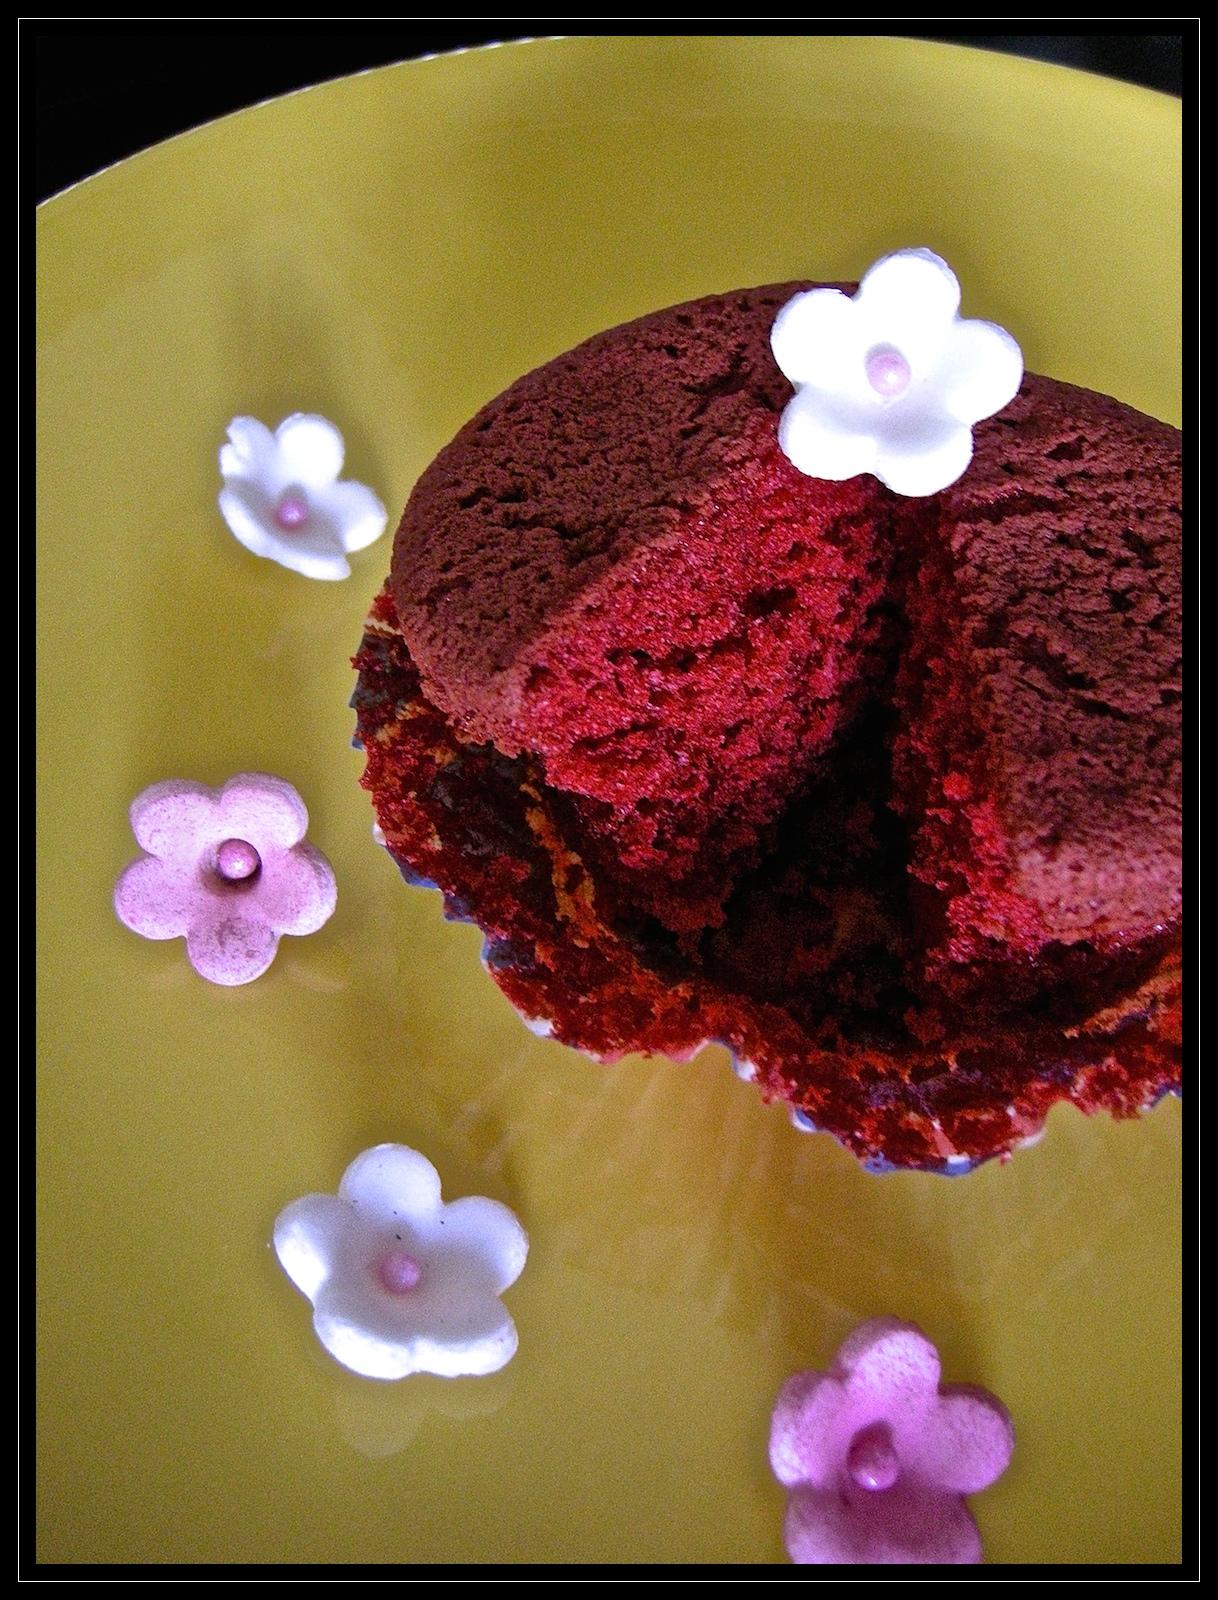 Red velvet cupcake (l'interno)